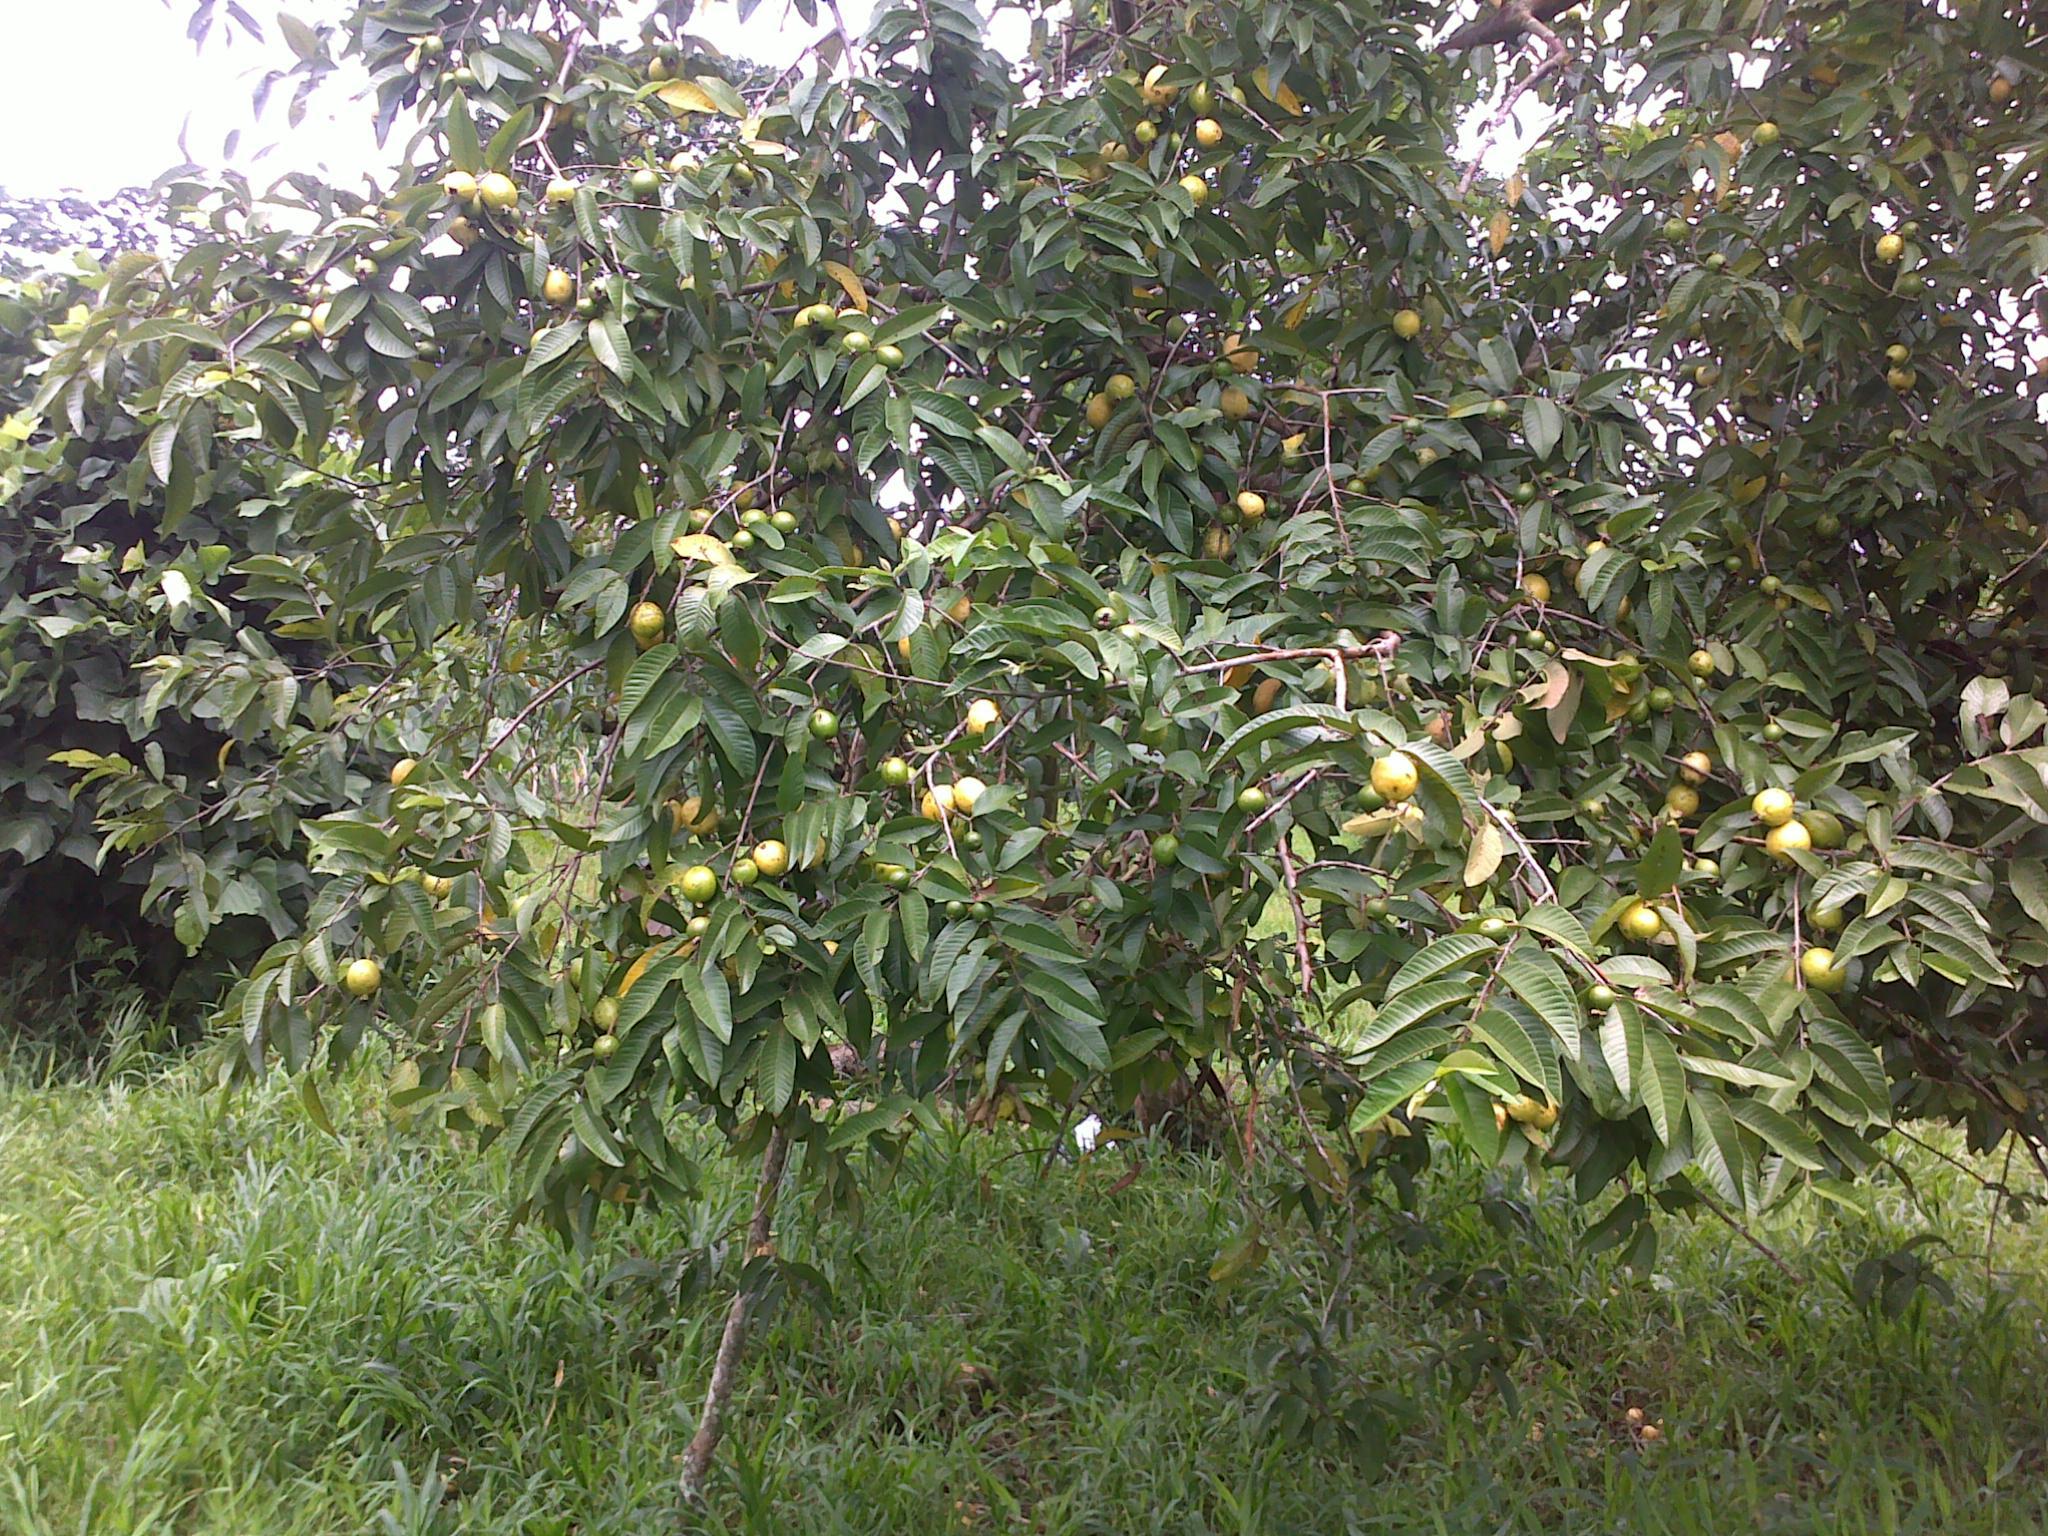 file193rbol en fructificaci243n de psidium guajavajpg